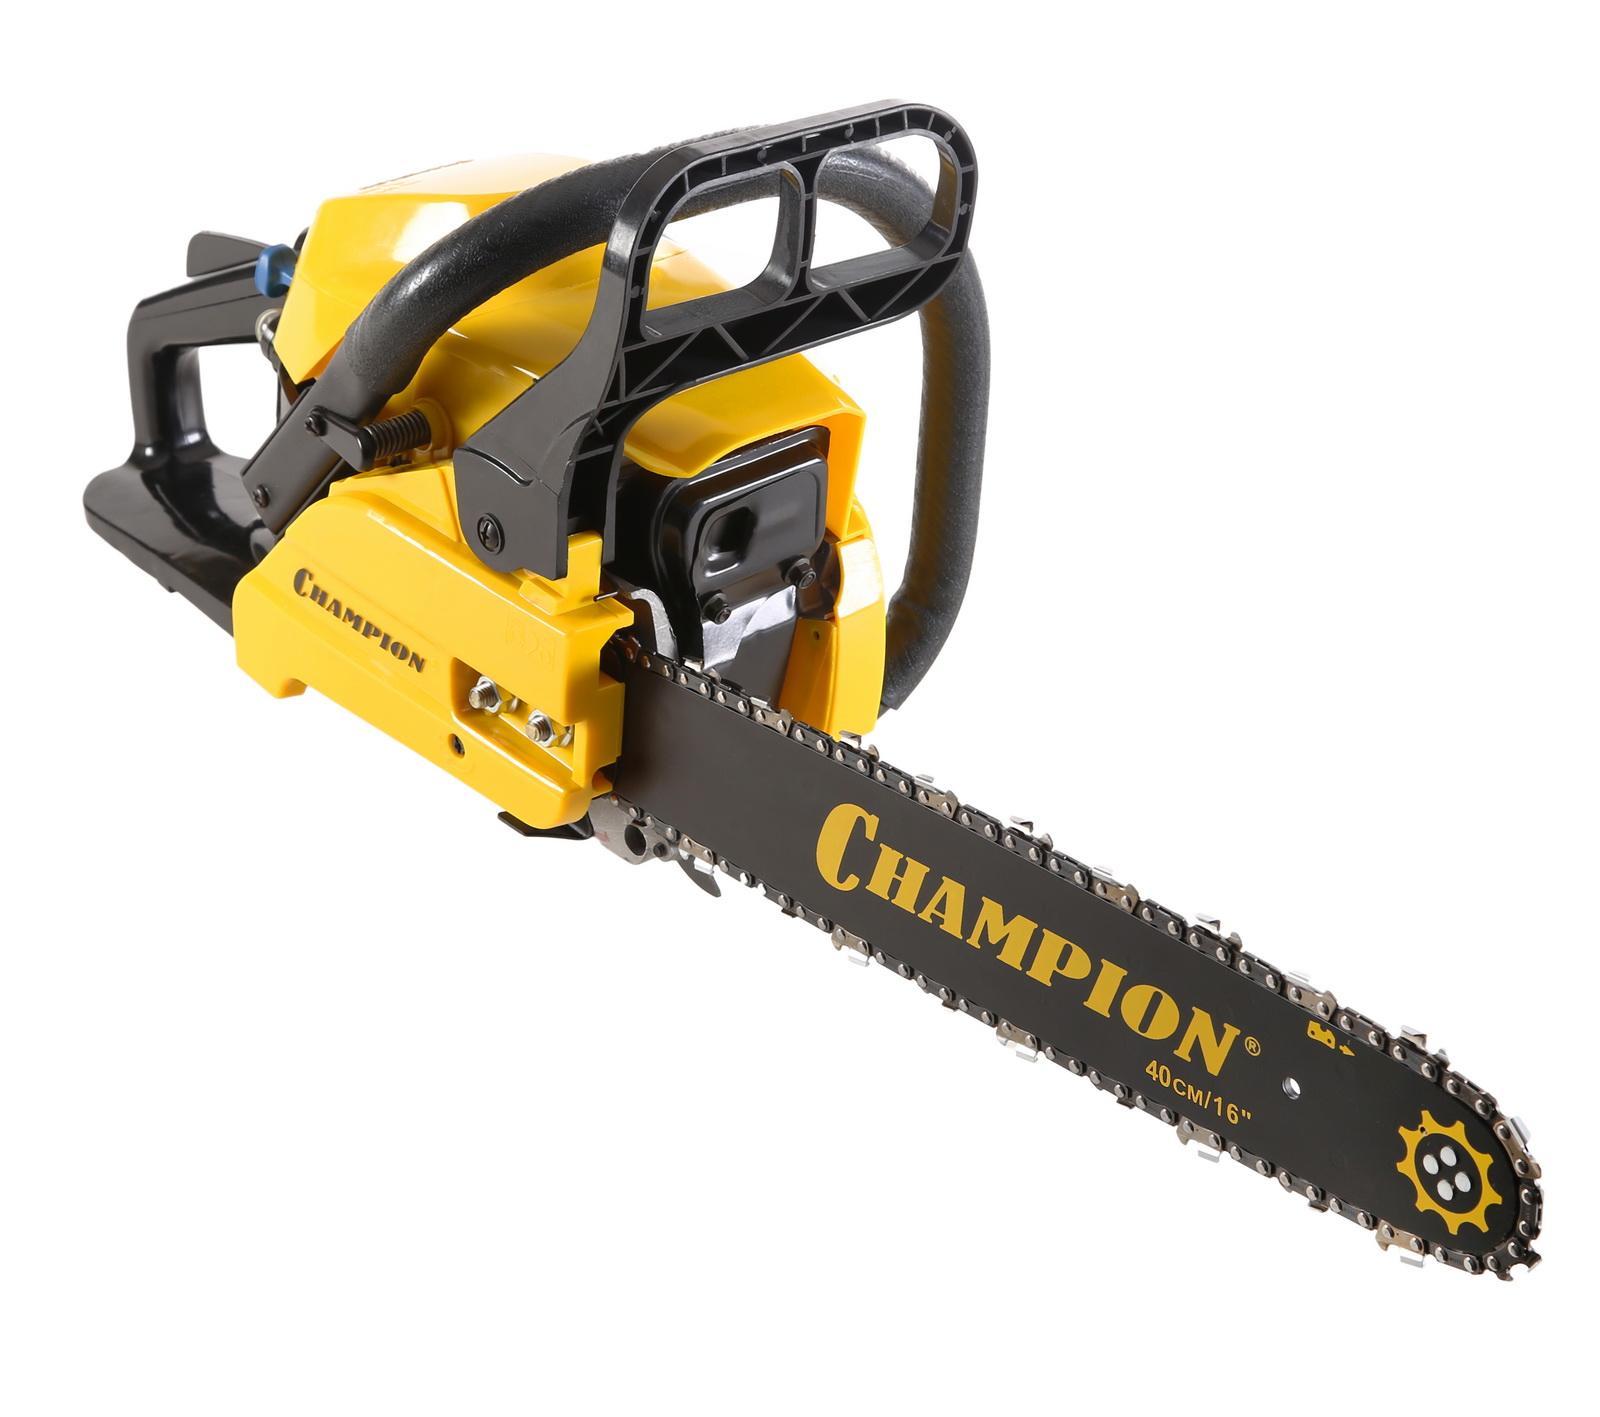 Бензопила Champion 137 садовая воздуходувка champion gb226